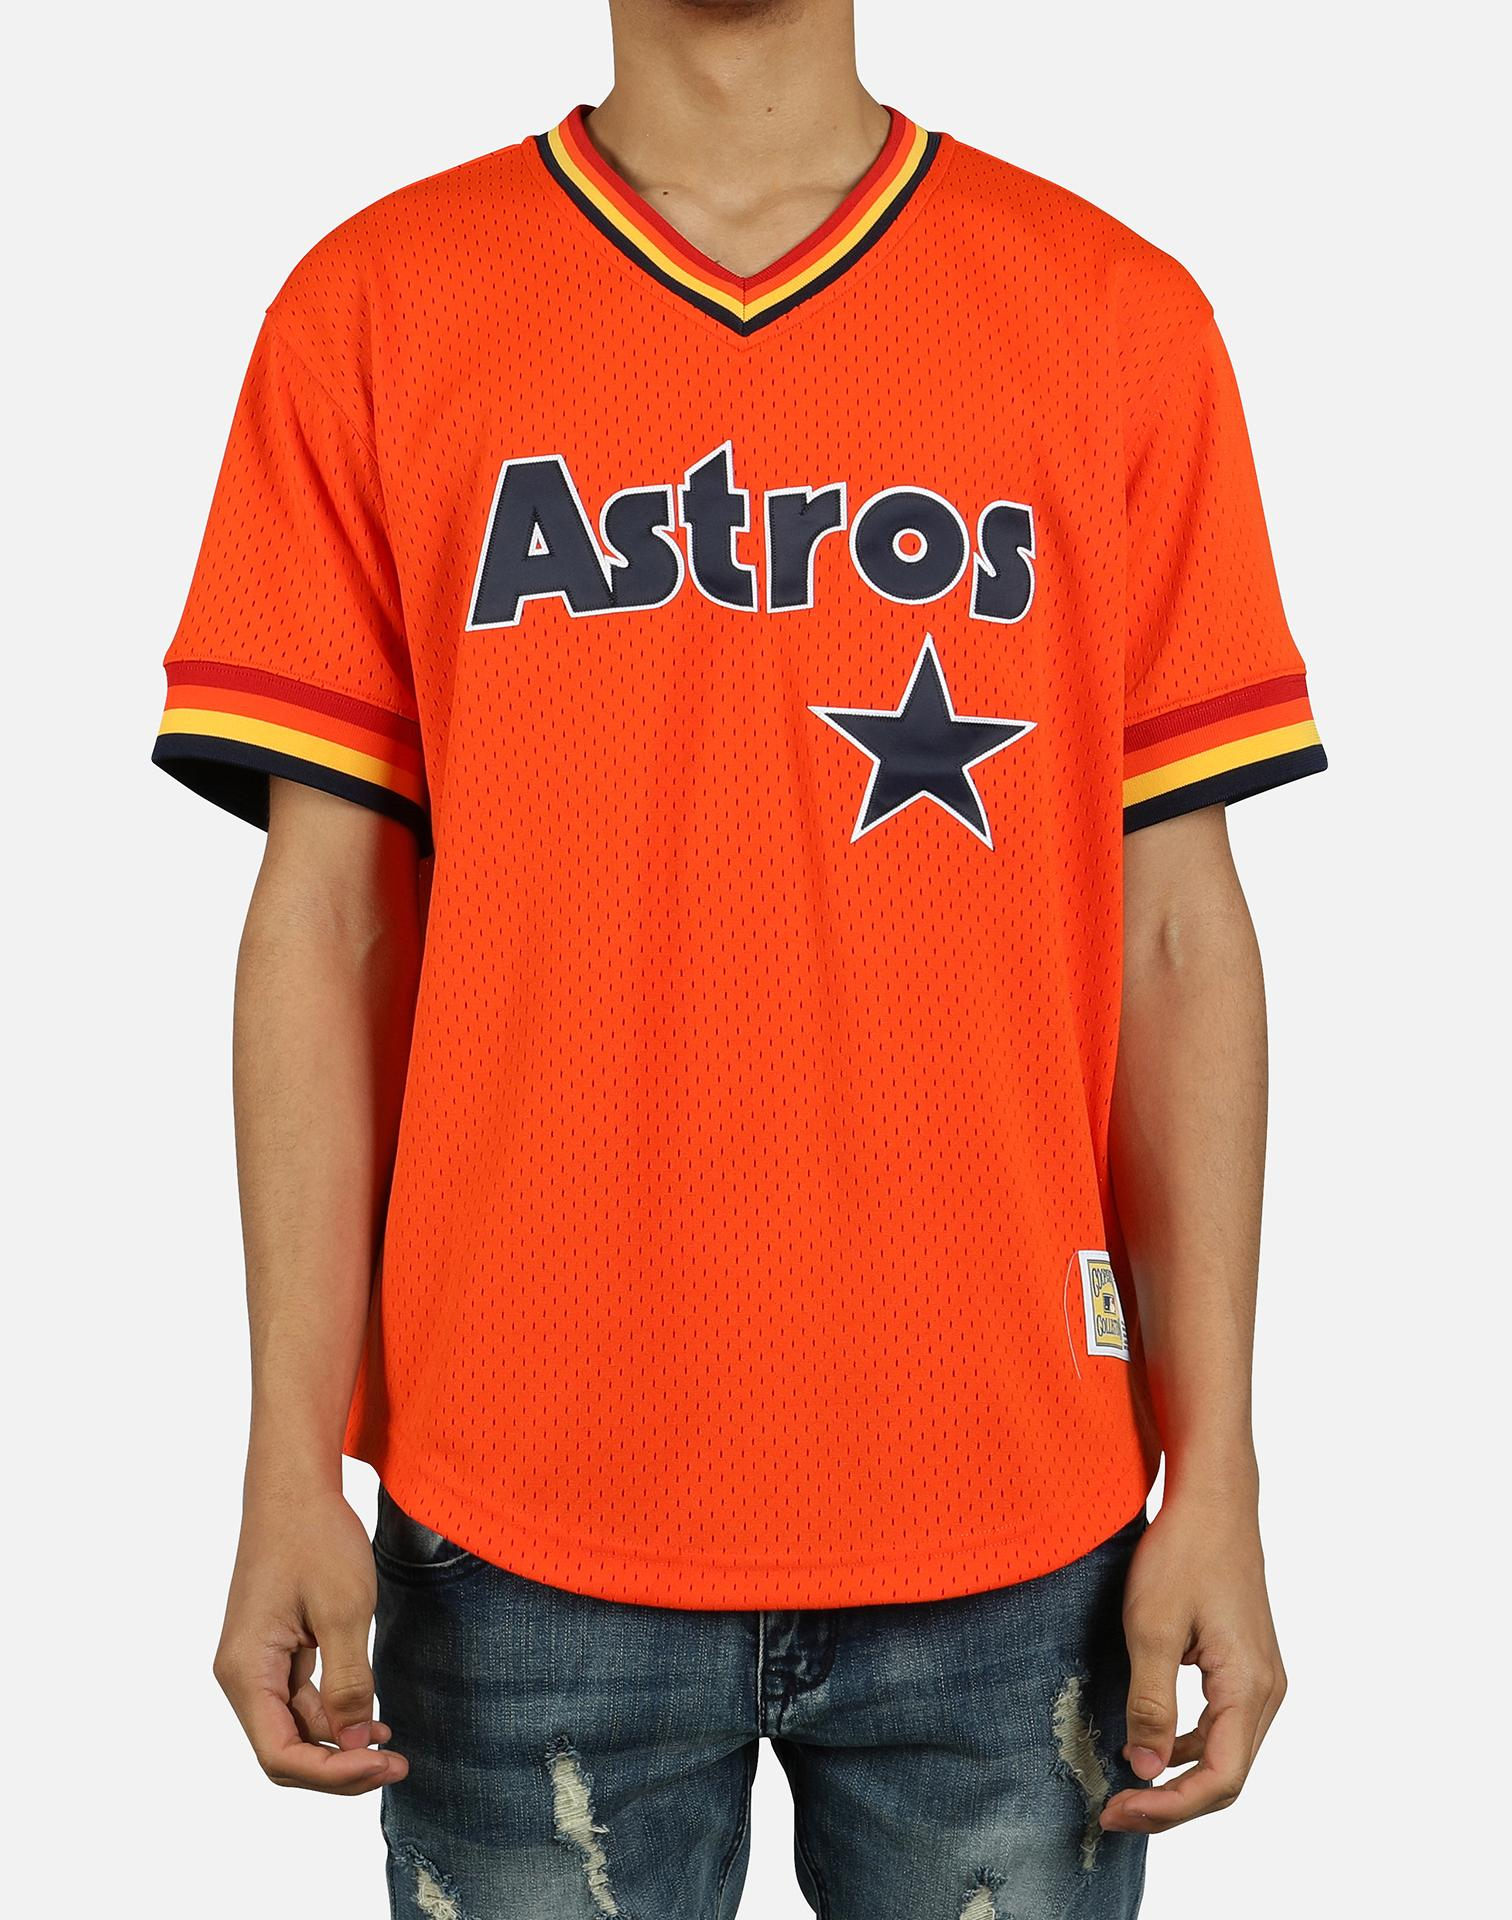 brand new 3d1af 4ae40 Men's Orange Mlb Houston Astros Mesh V-neck Jersey